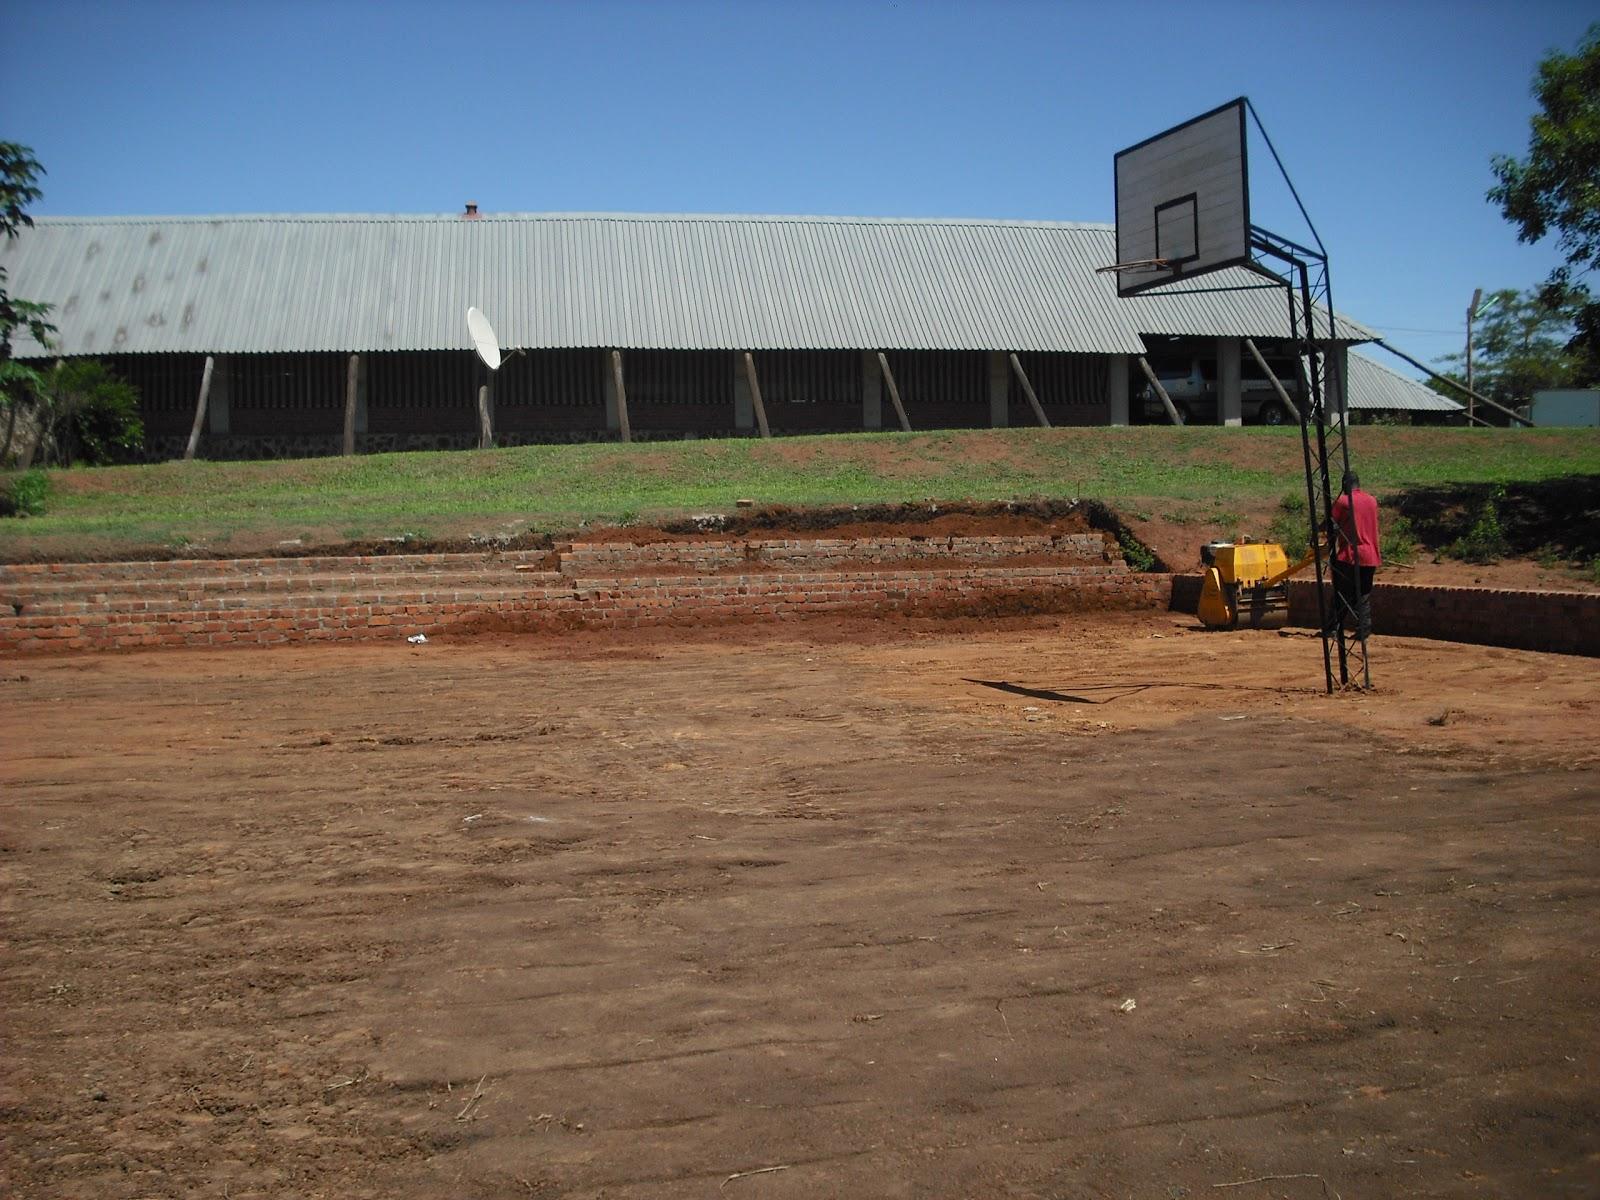 Centro Educacional Njerenje Basketball Court Being Built